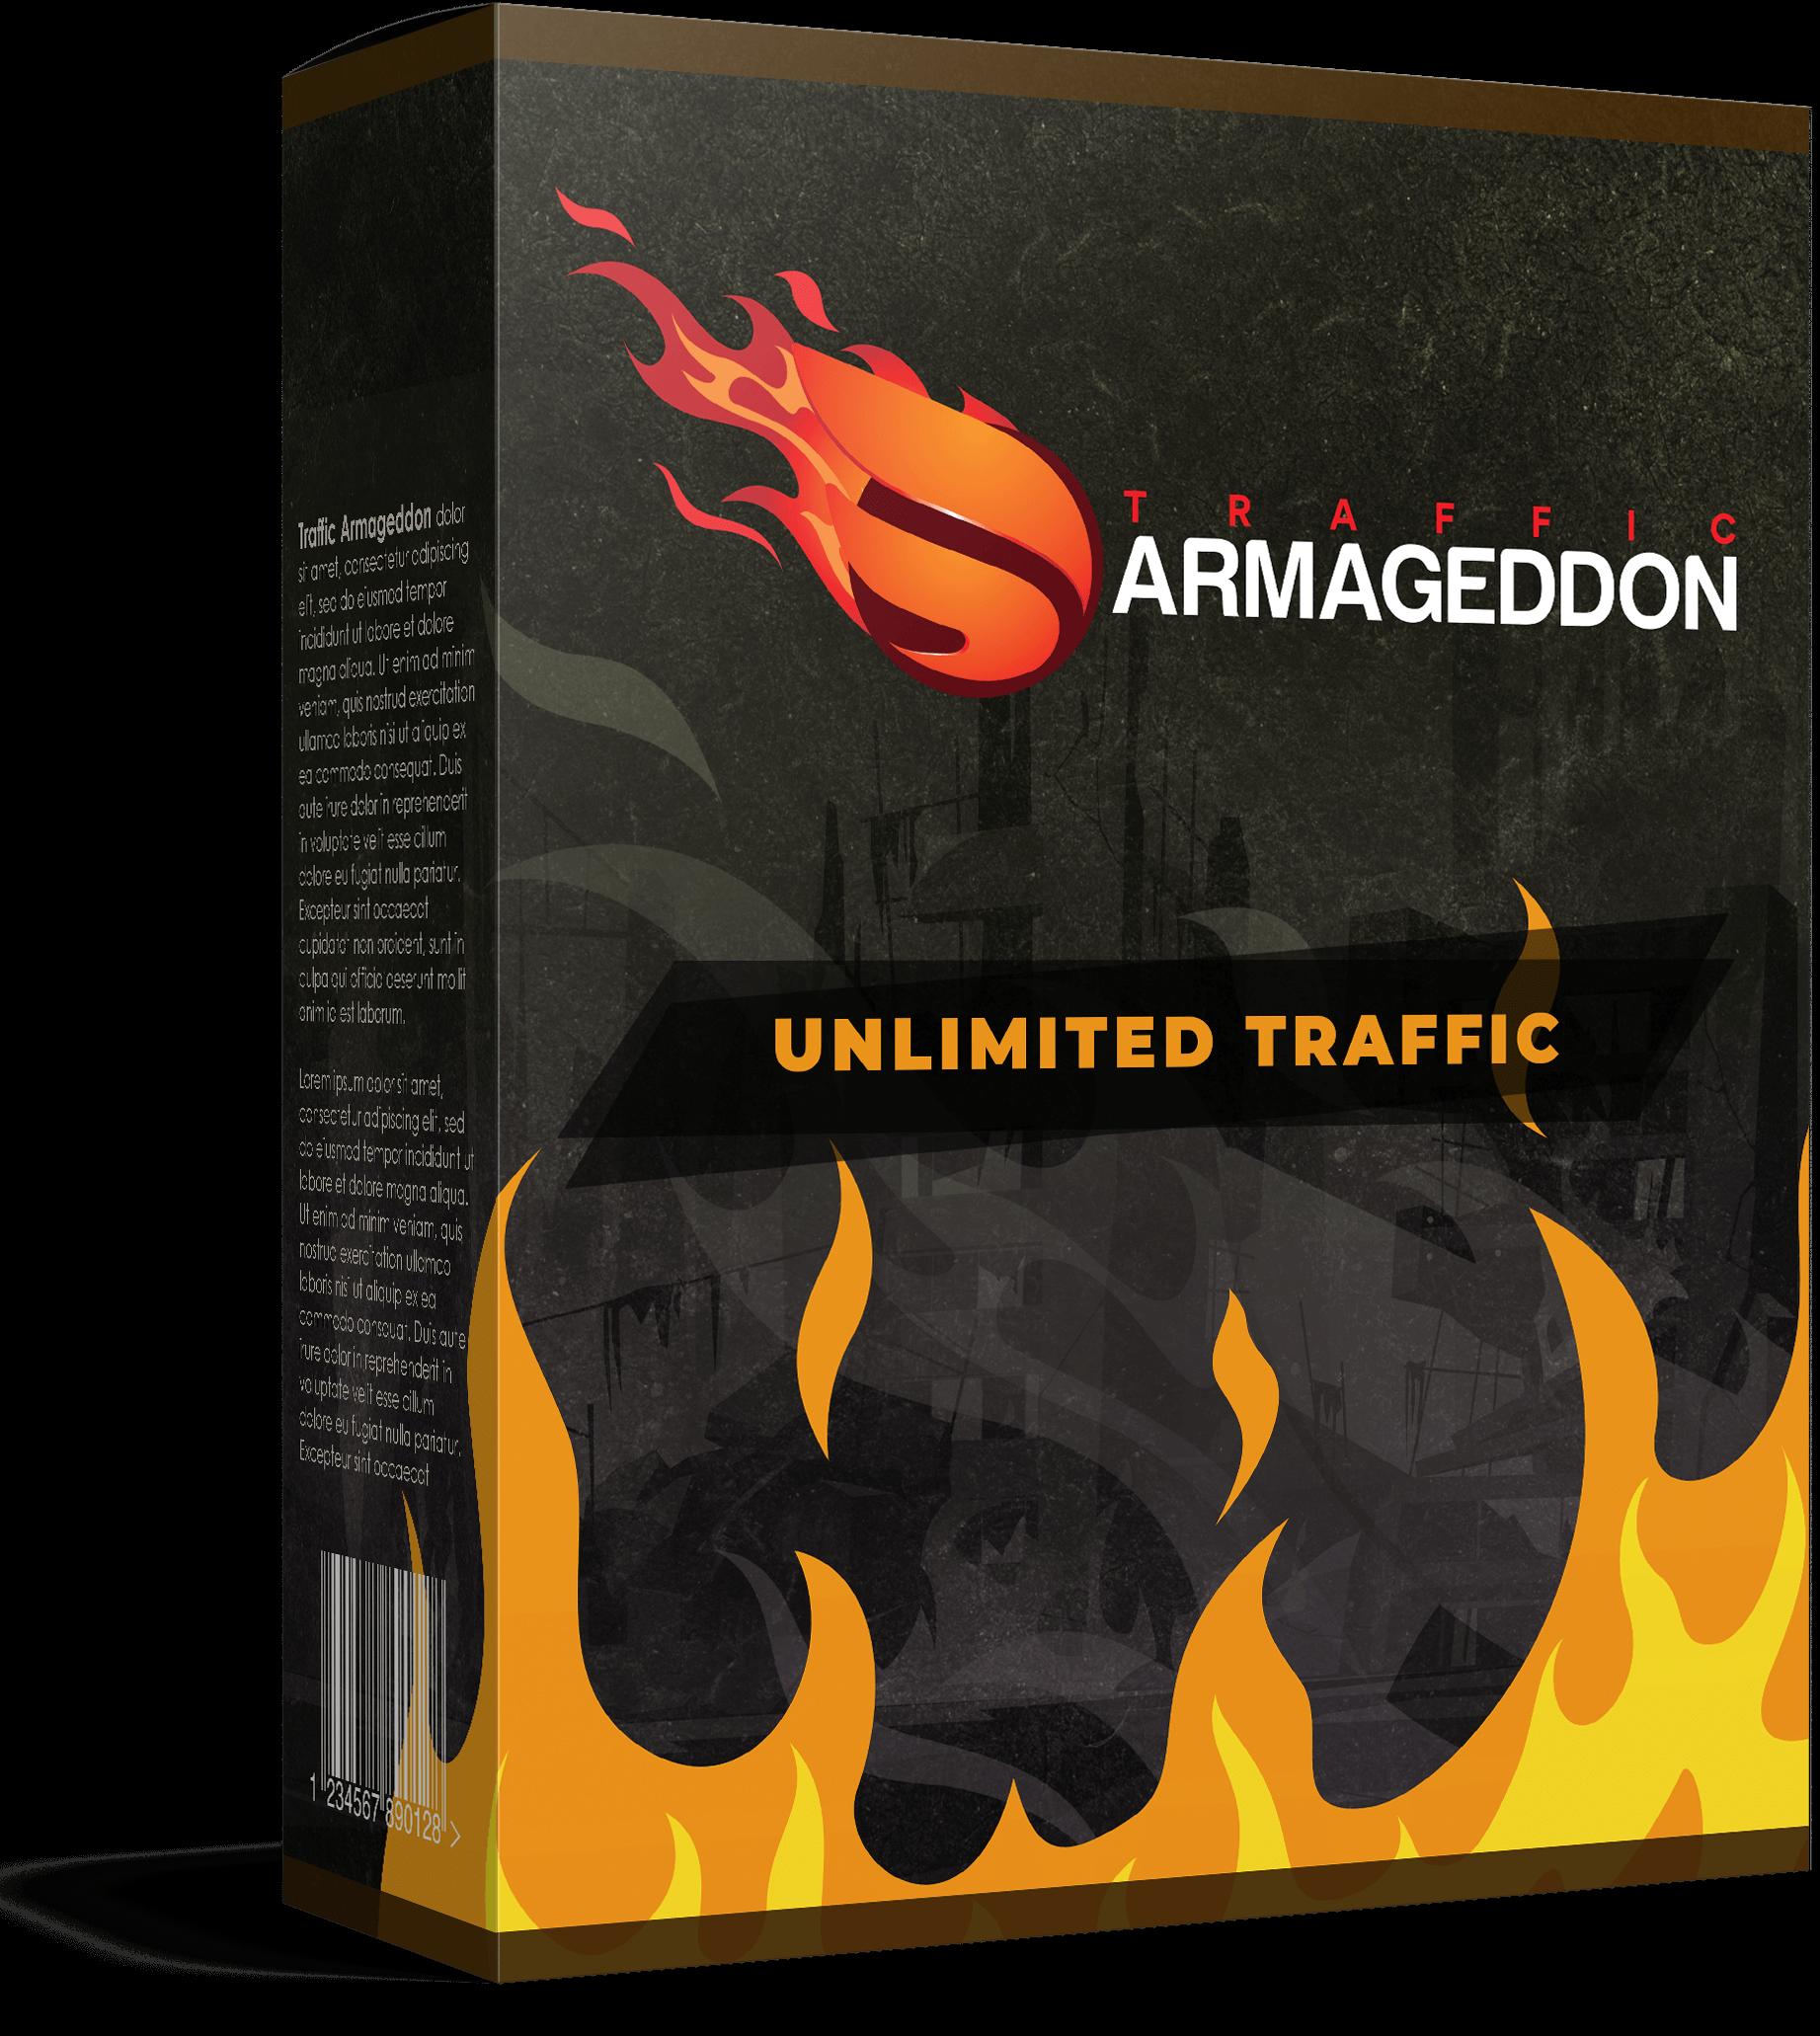 Traffic-Armageddon-OTO3